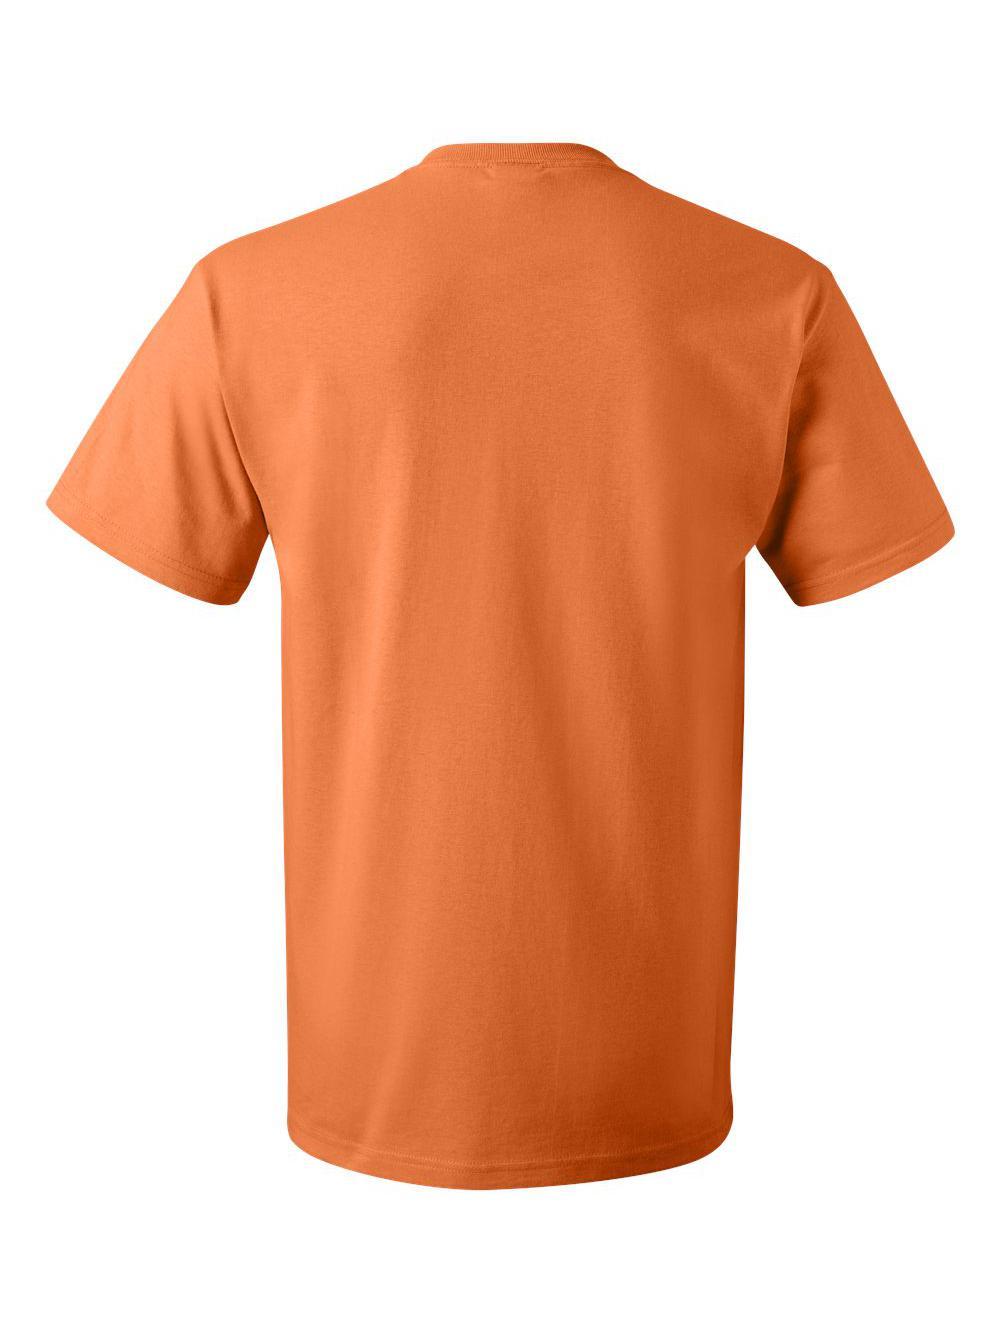 Fruit-of-the-Loom-HD-Cotton-Short-Sleeve-T-Shirt-3930R thumbnail 130